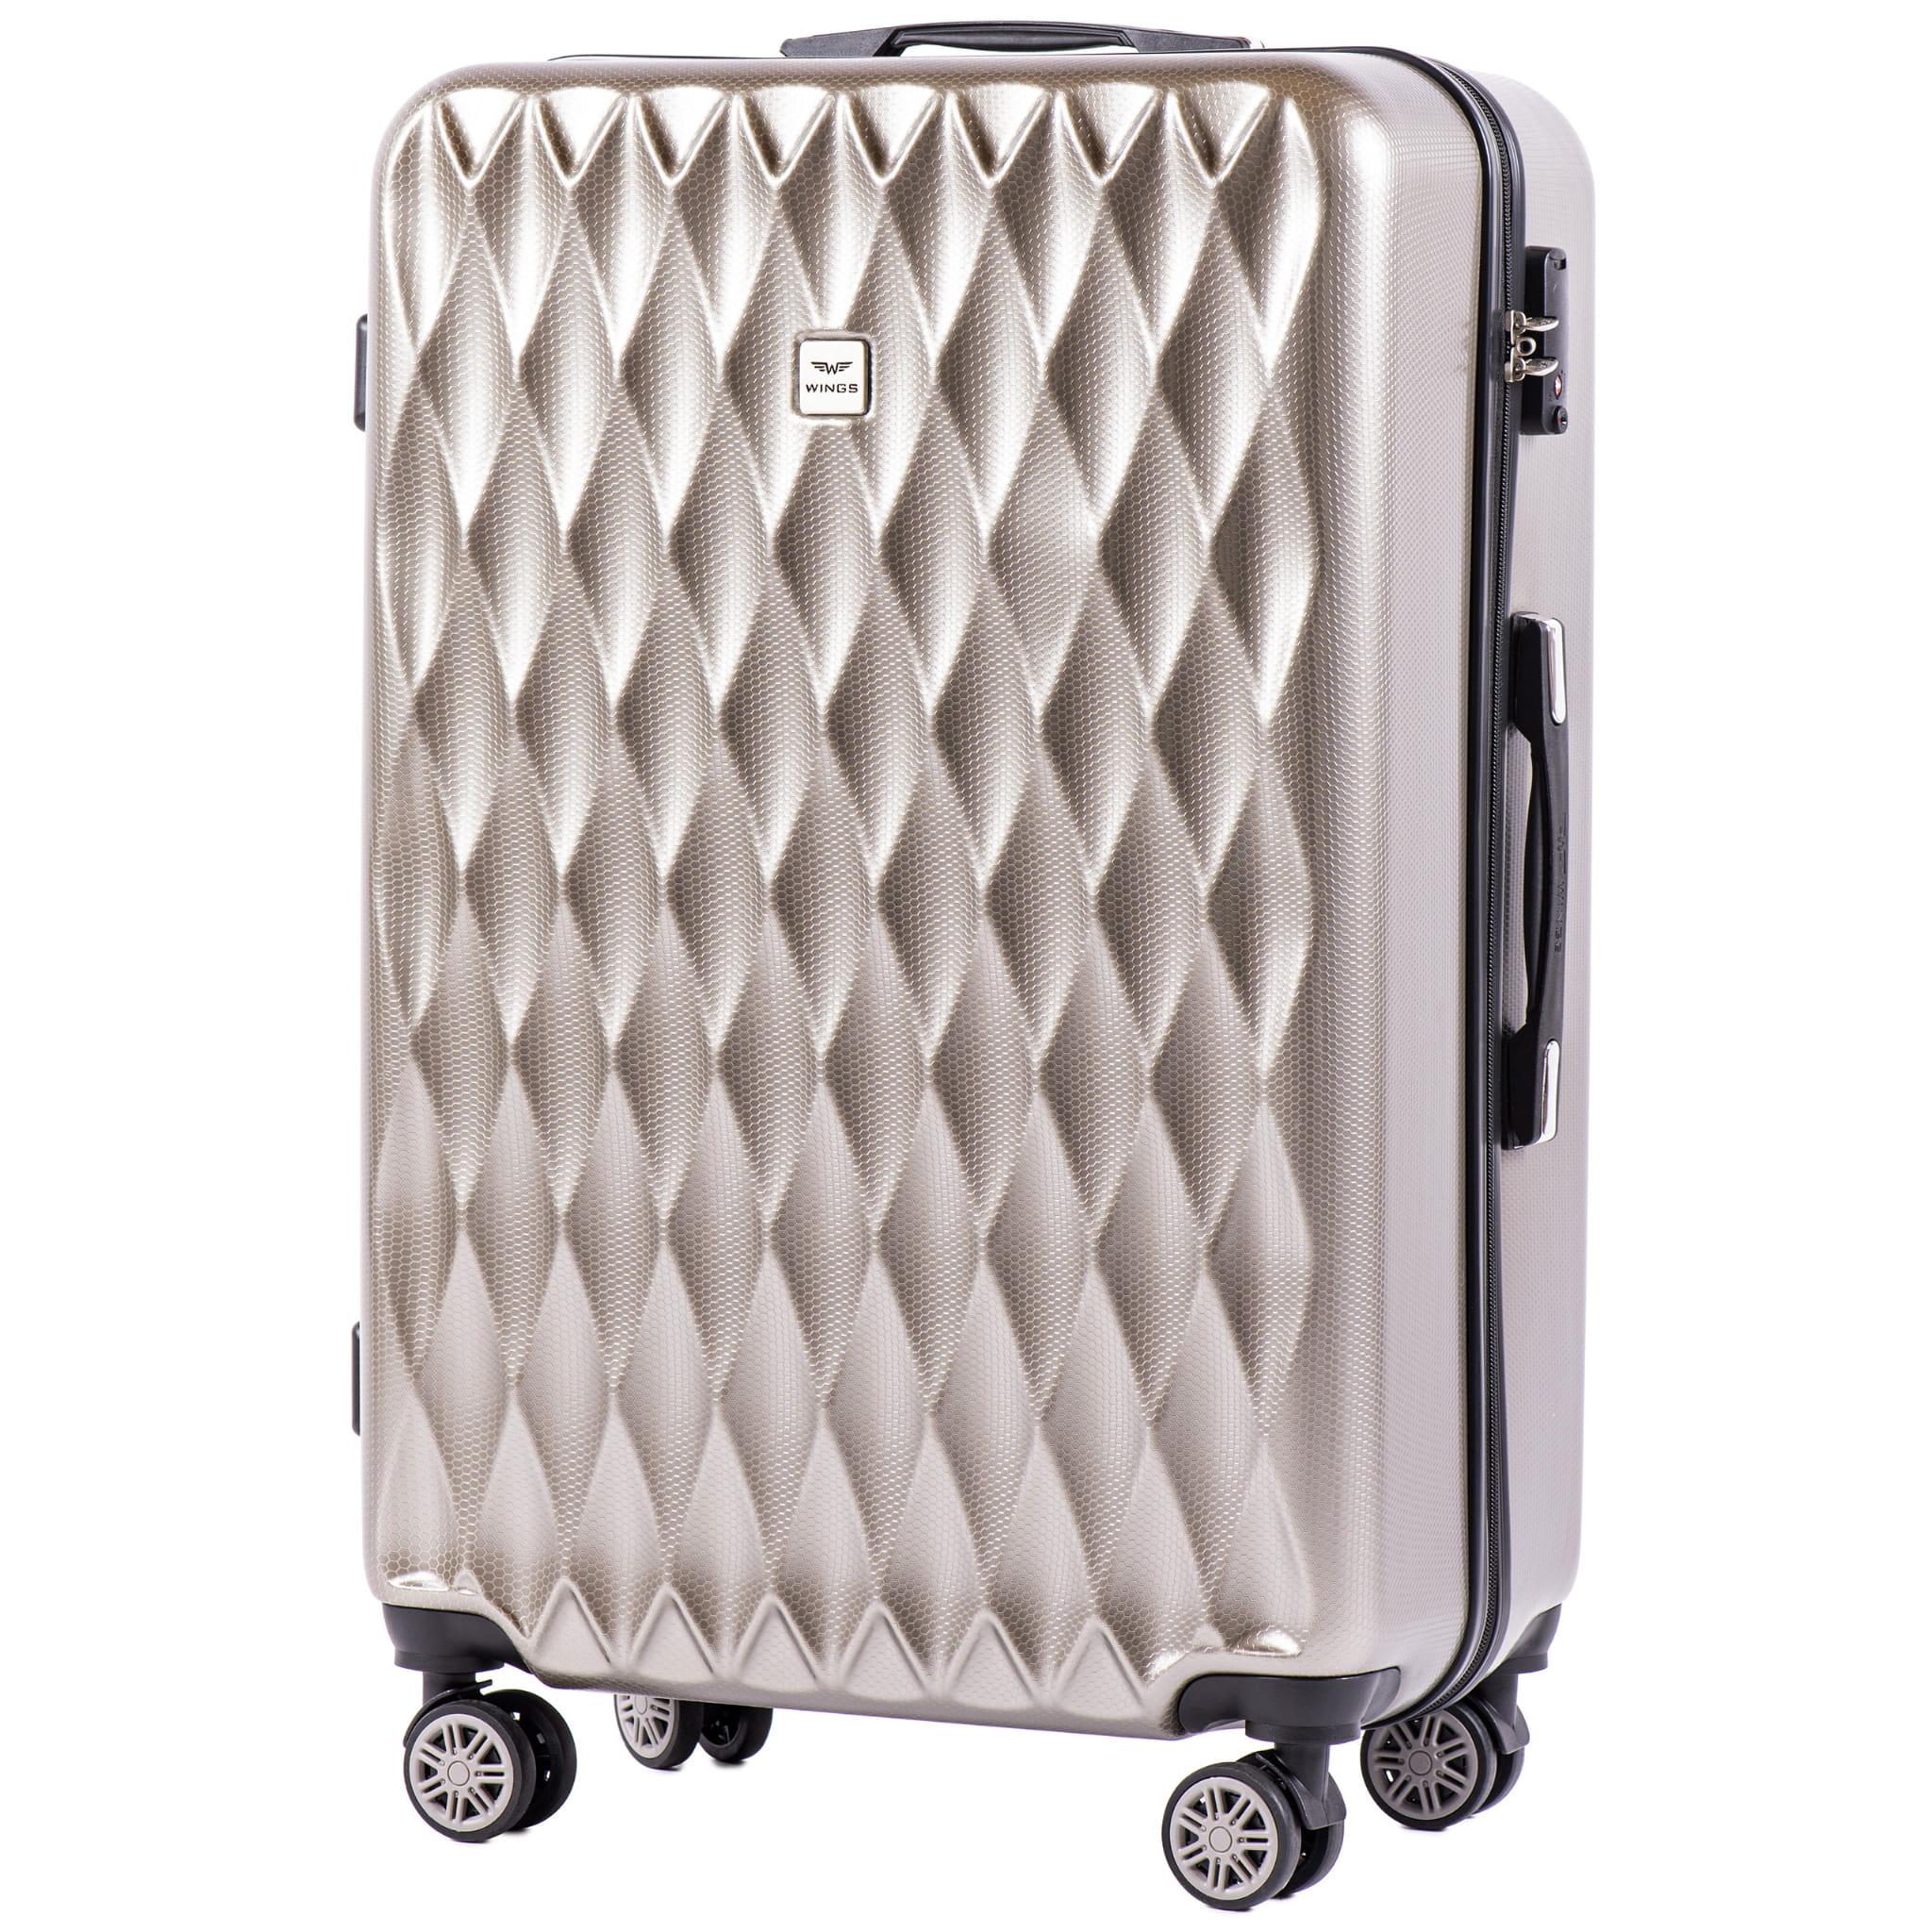 БОЛЬШОЙ ЧЕМОДАН WINGS PC190 L BRONZE  PREMIUM НА 4-Х КАУЧУКОВЫХ КОЛЕСАХ! Для багажа ,до 23 кг!